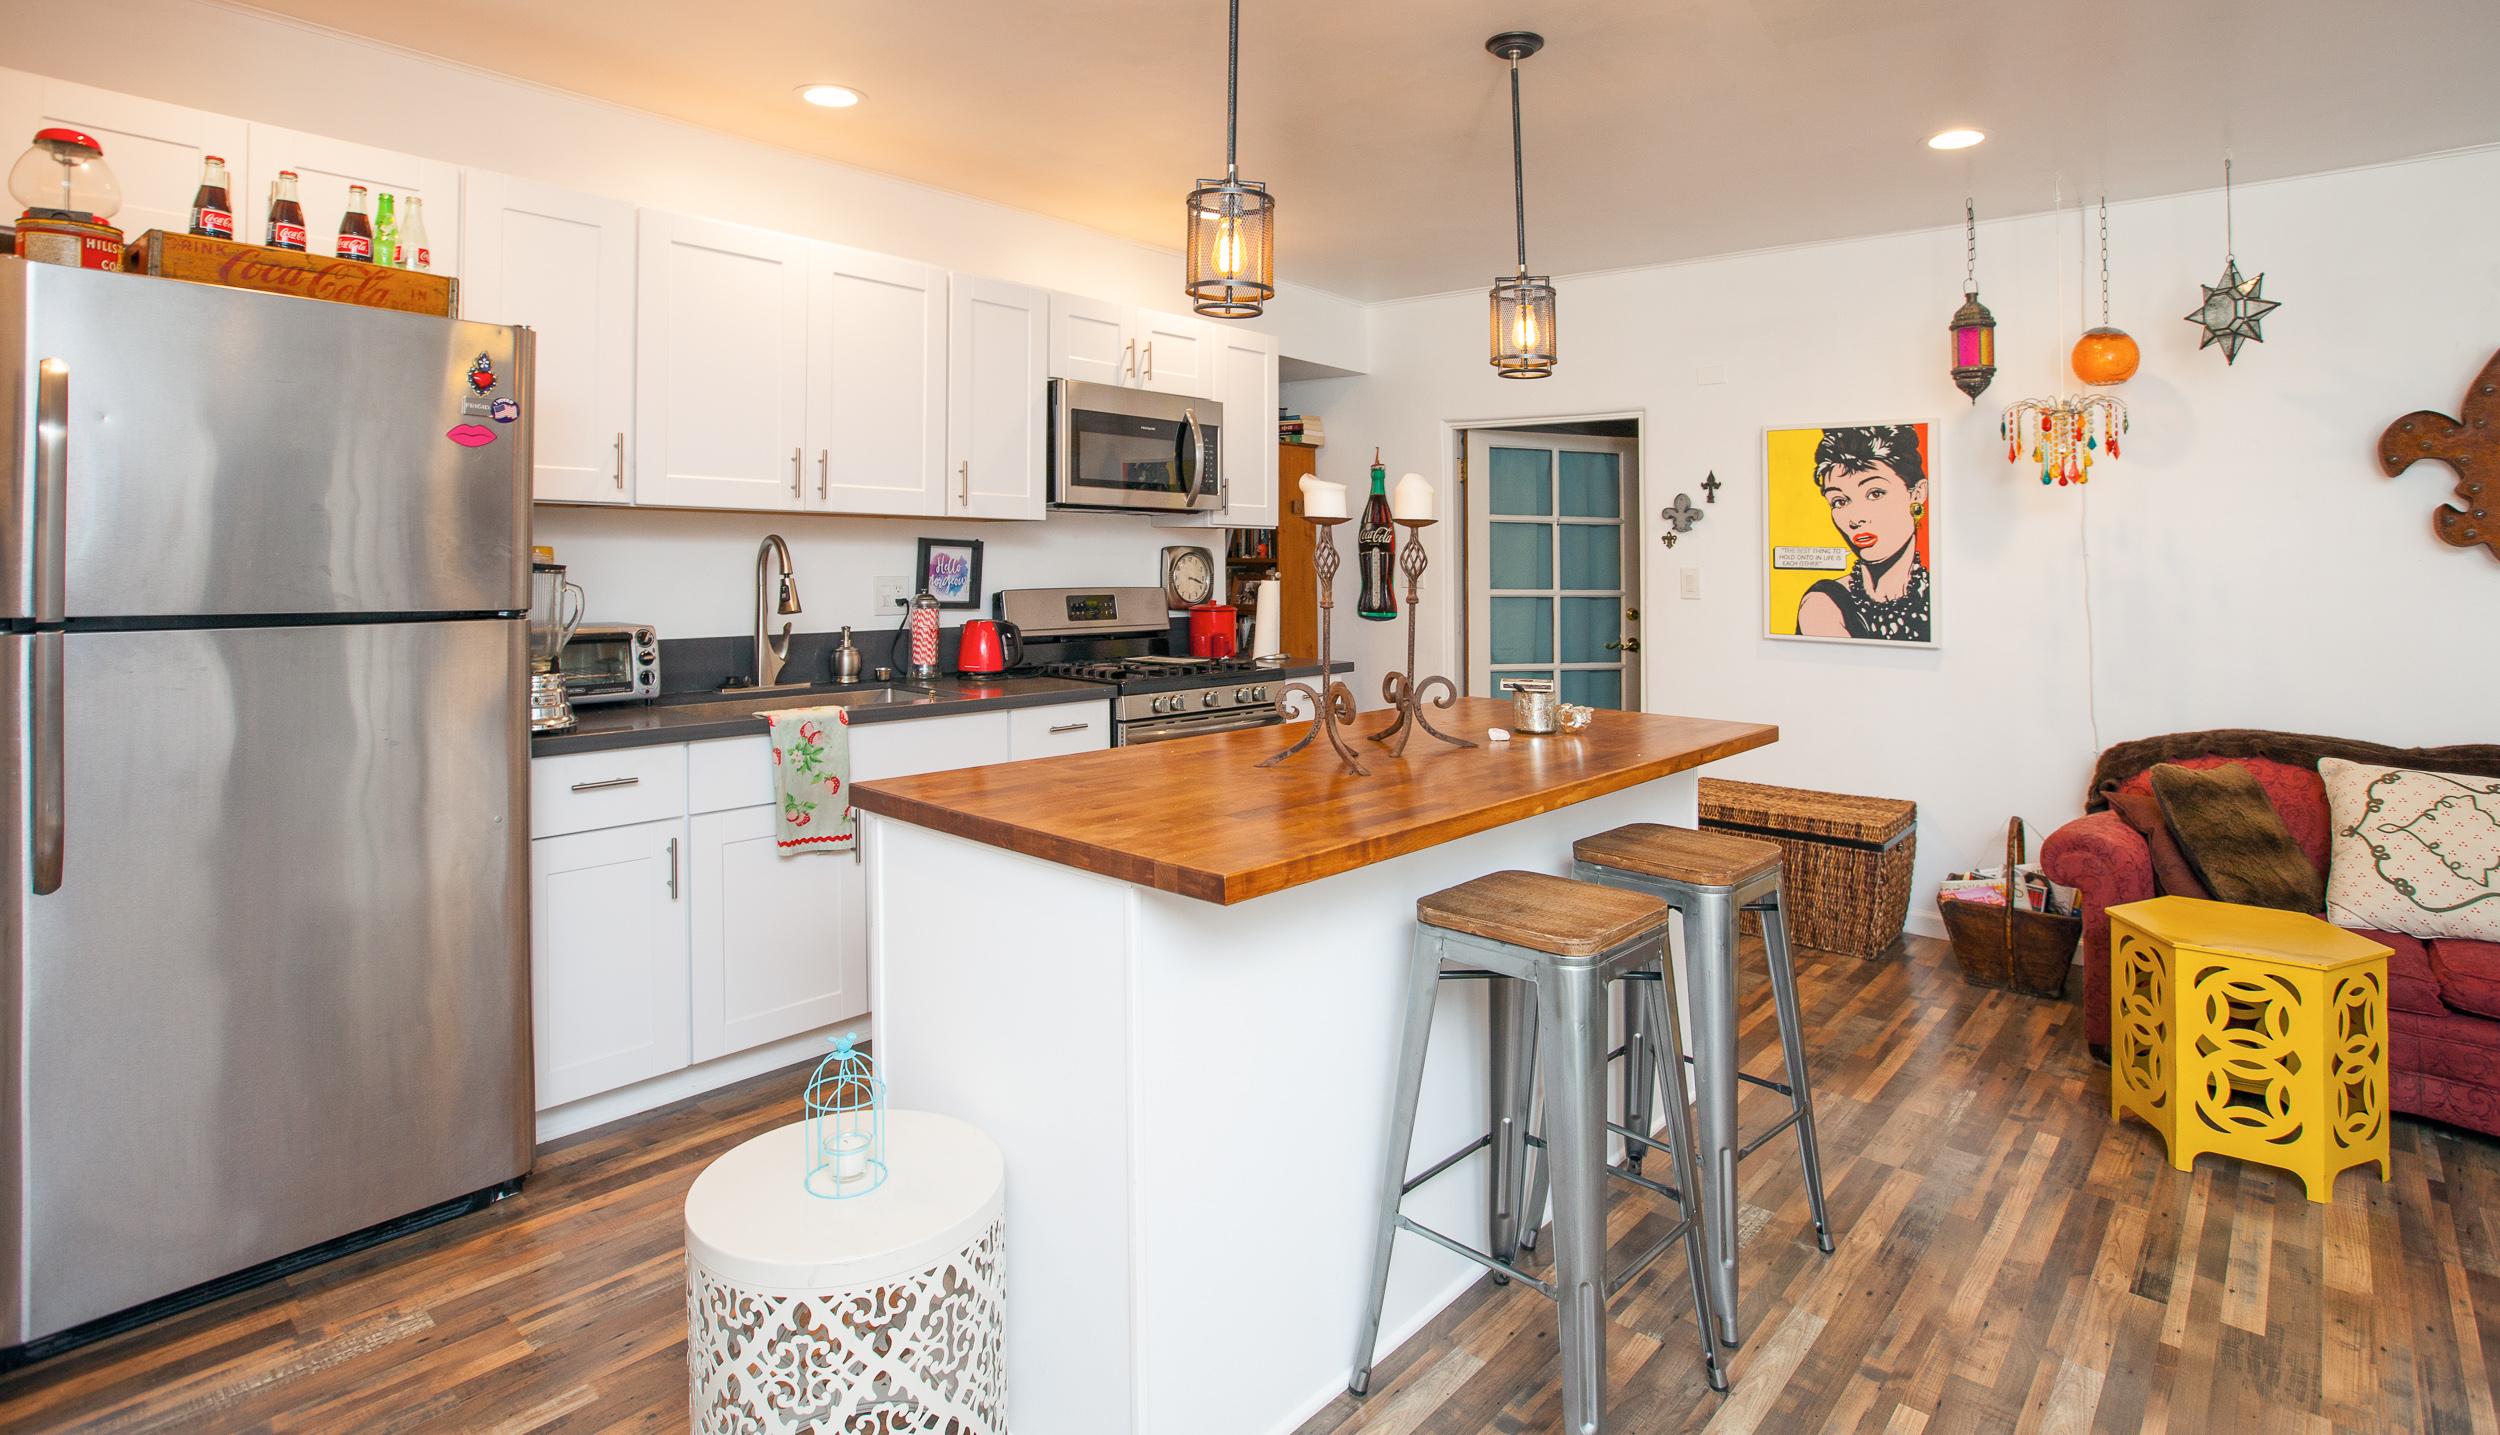 114 west alamar santa barbara california home for sale